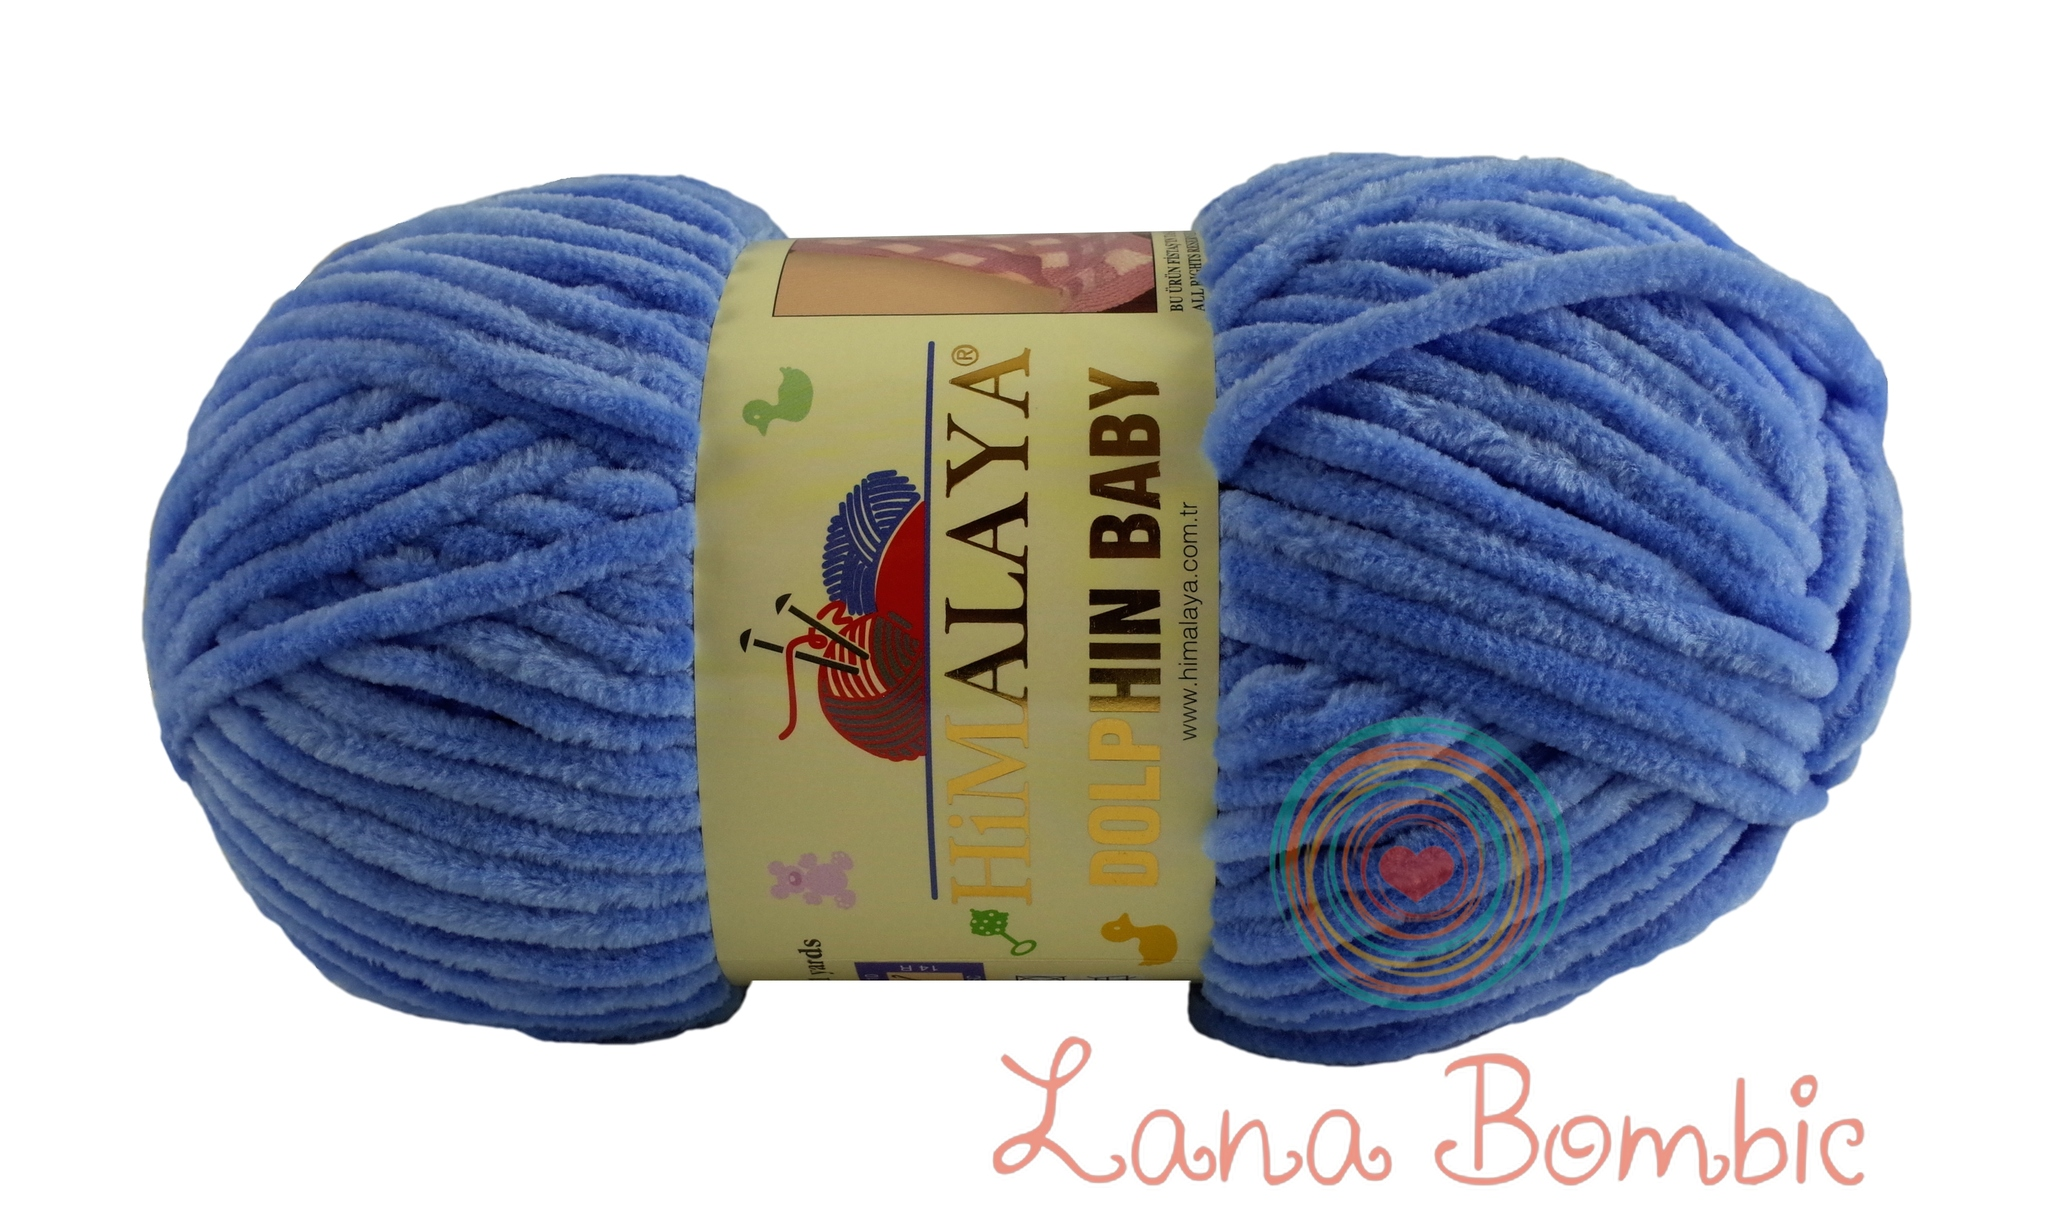 Пряжа Himalaya Dolphin Baby арт. 80327 ярко-голубой